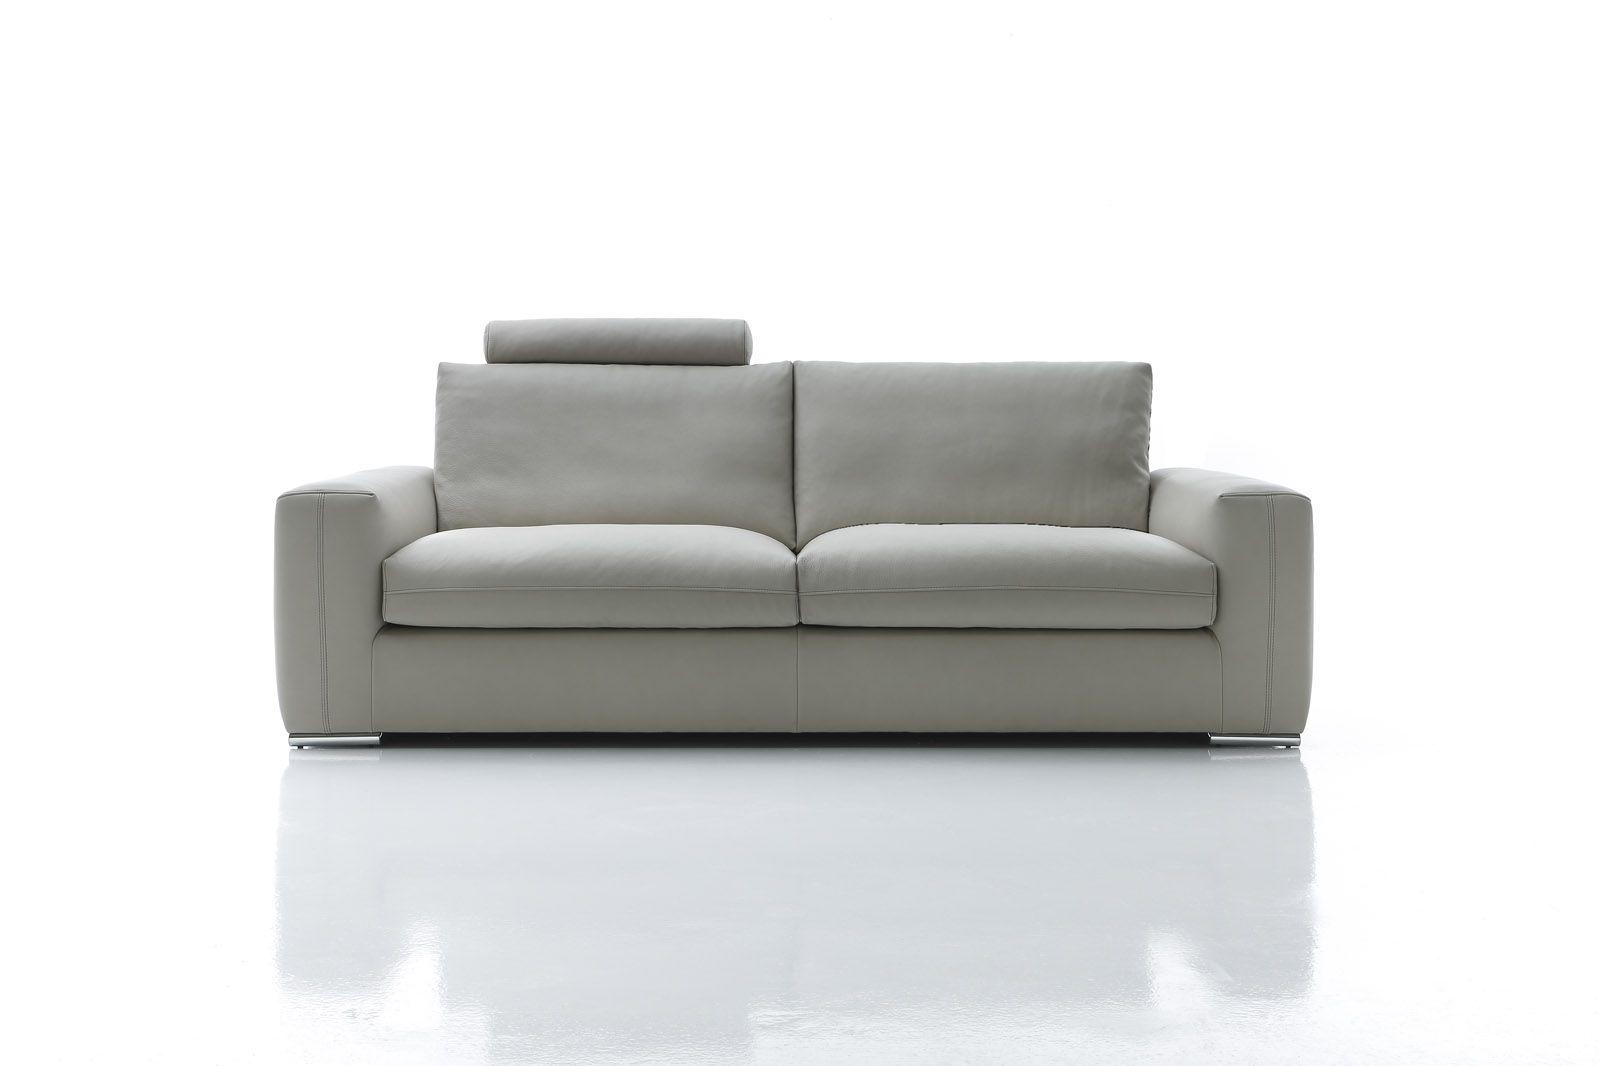 divano due posti grande in pelle Charles Tino Mariani